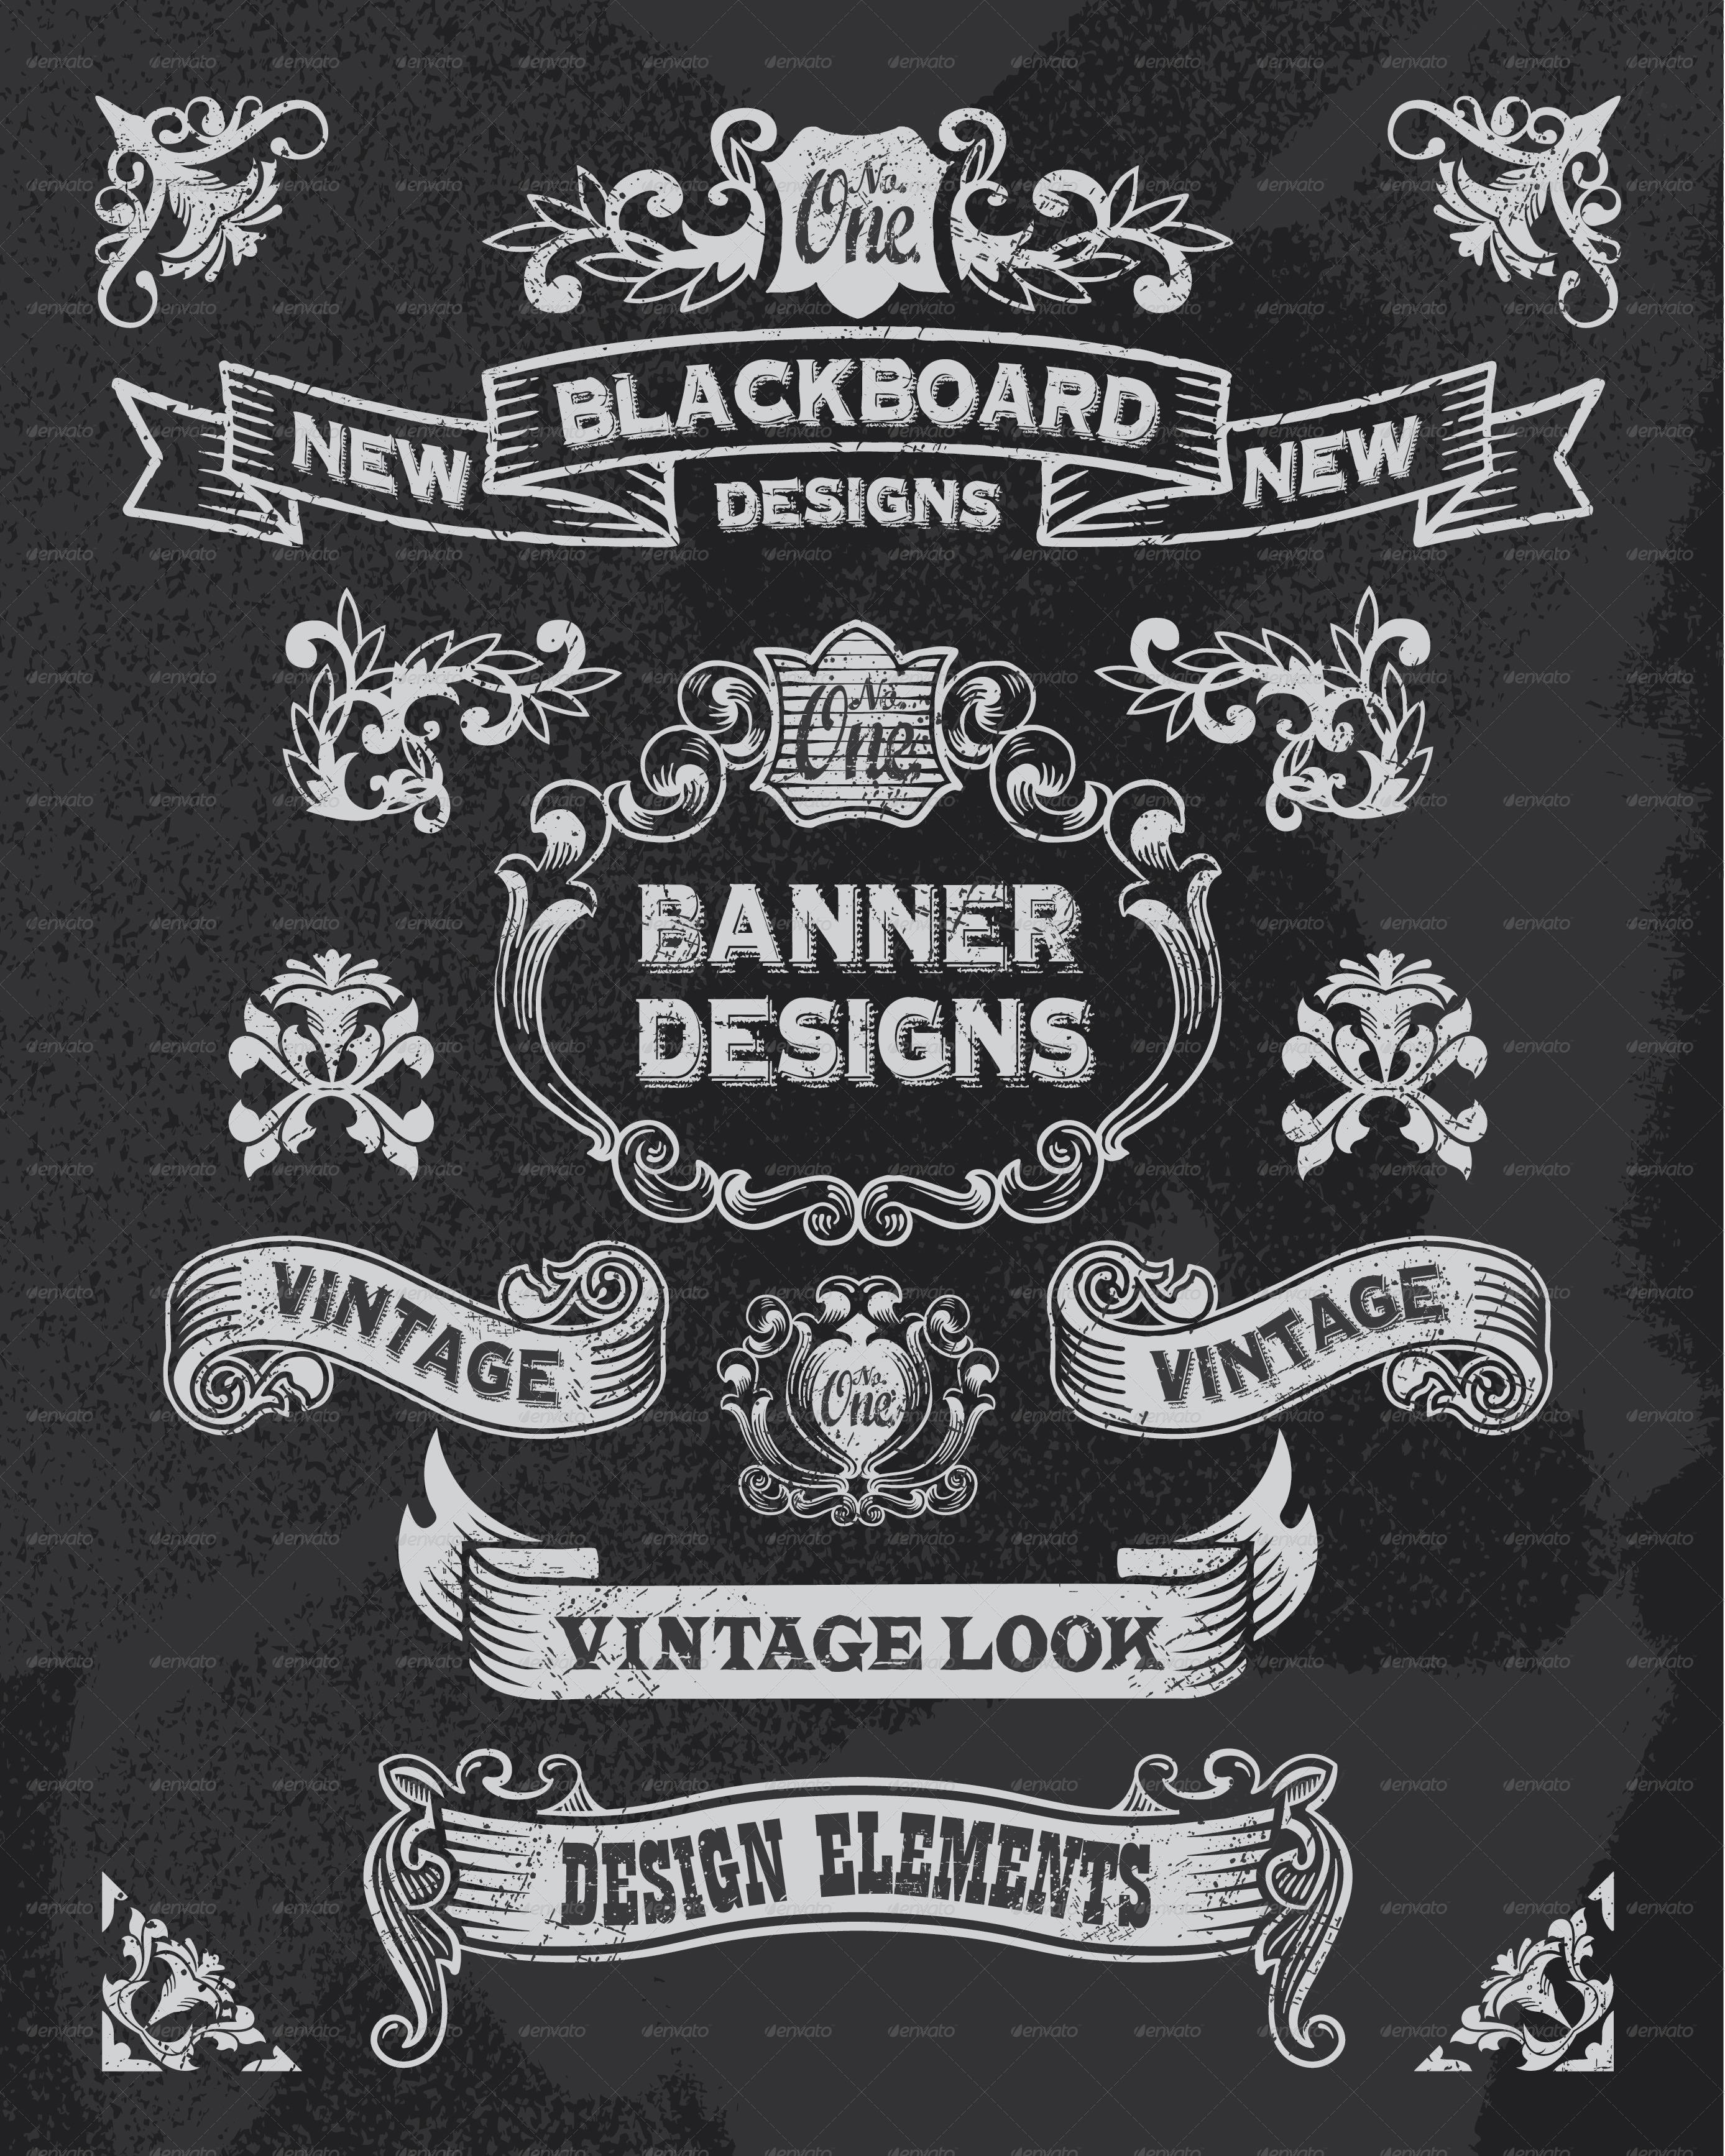 retro banner and ribbon blackboard design set by rtguest